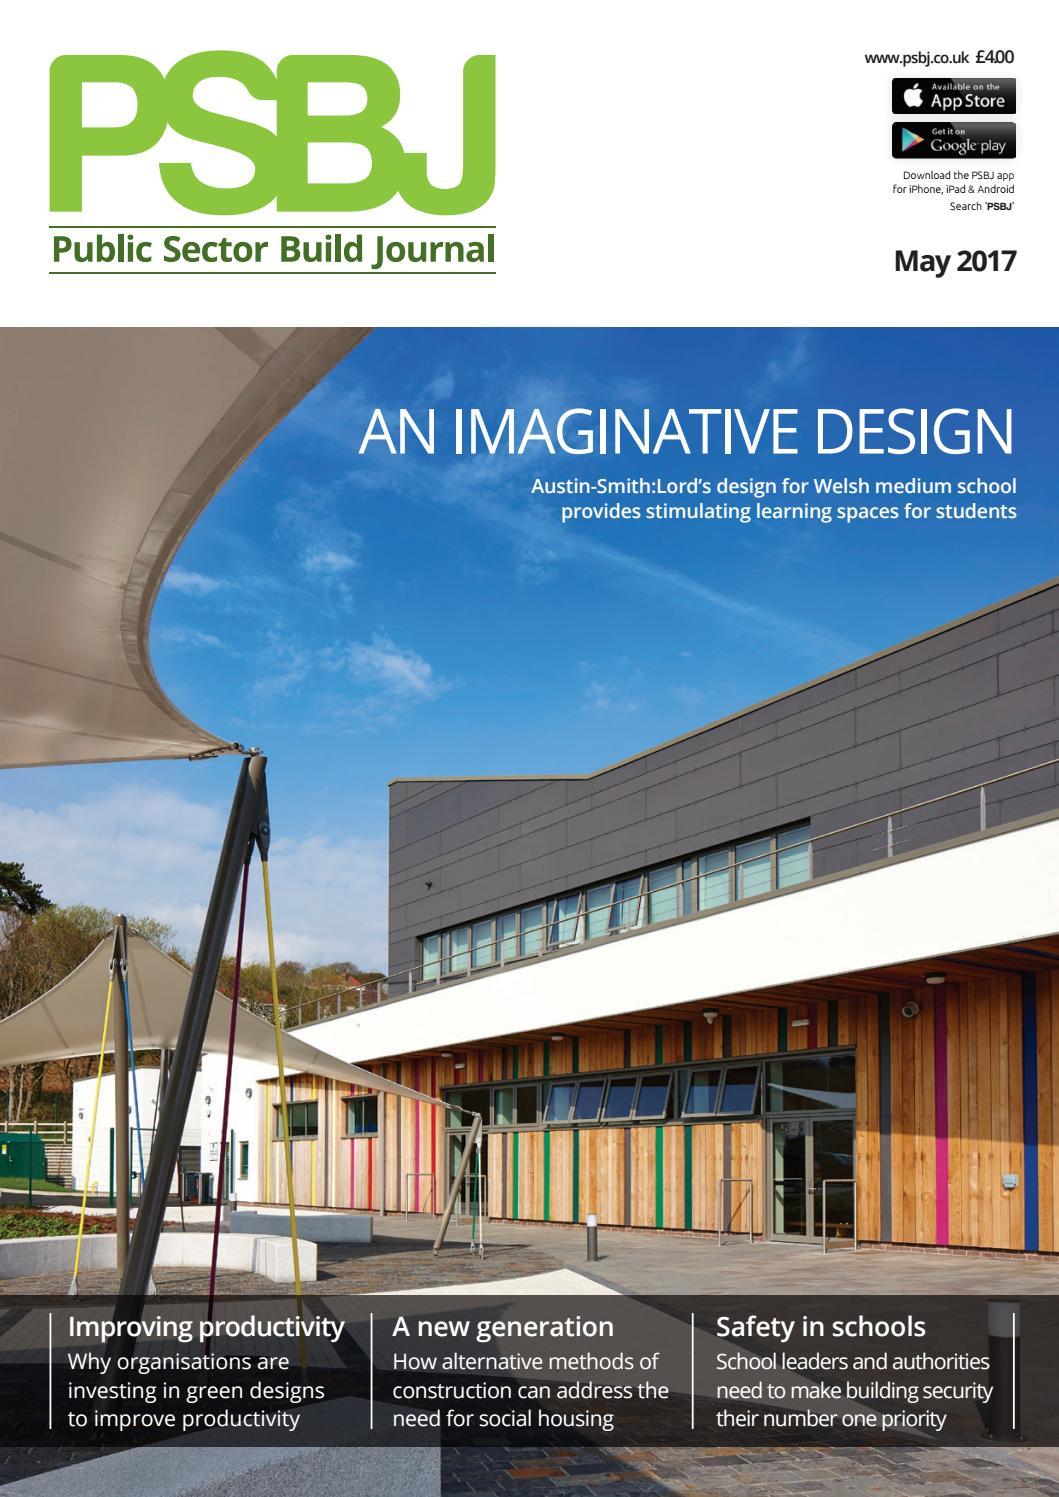 PSBJ May 2017 by Mixed Media - issuu